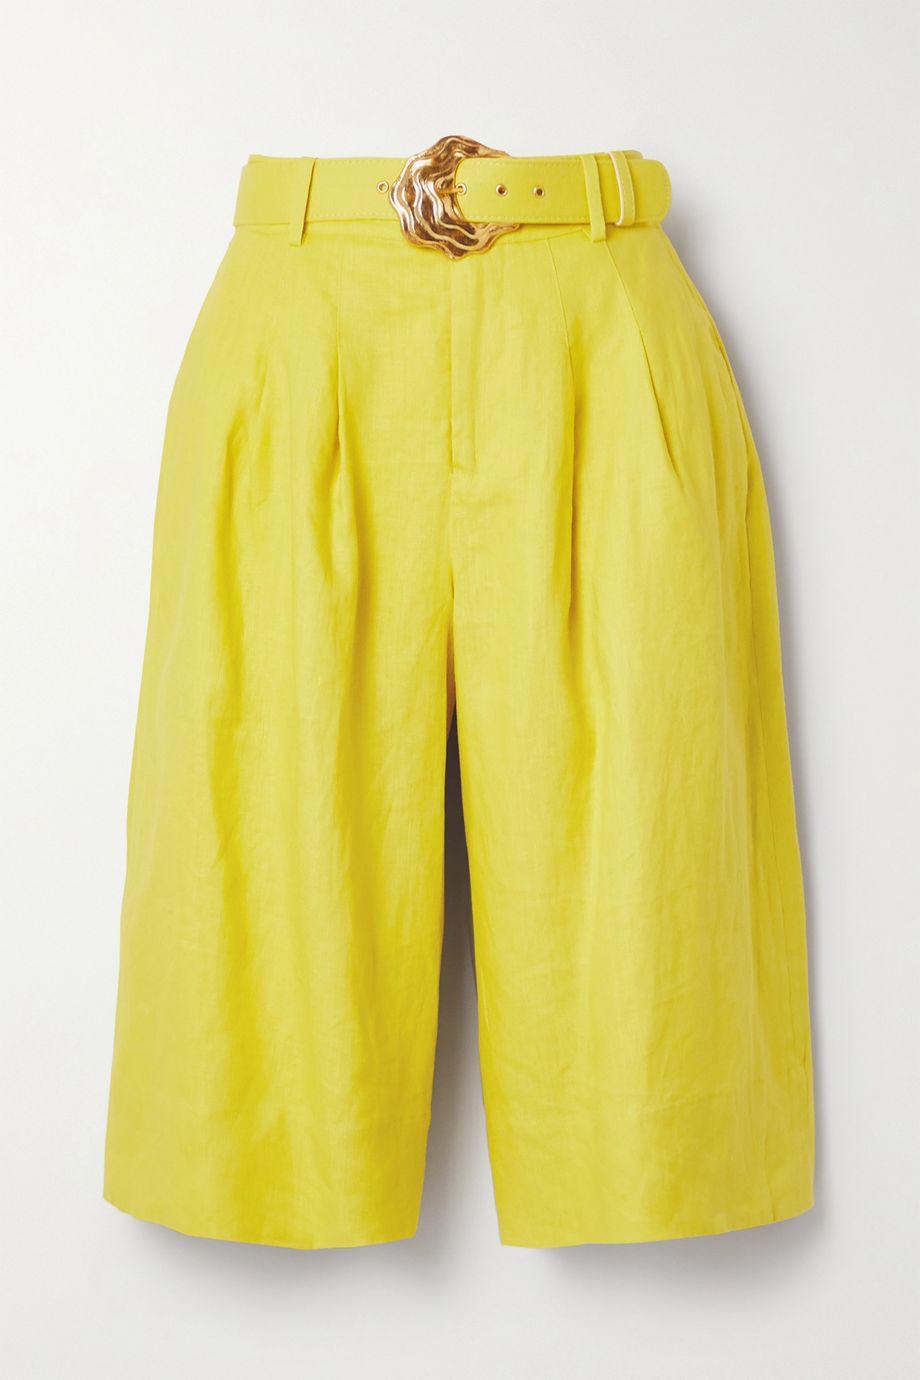 NICHOLAS Clara belted linen shorts